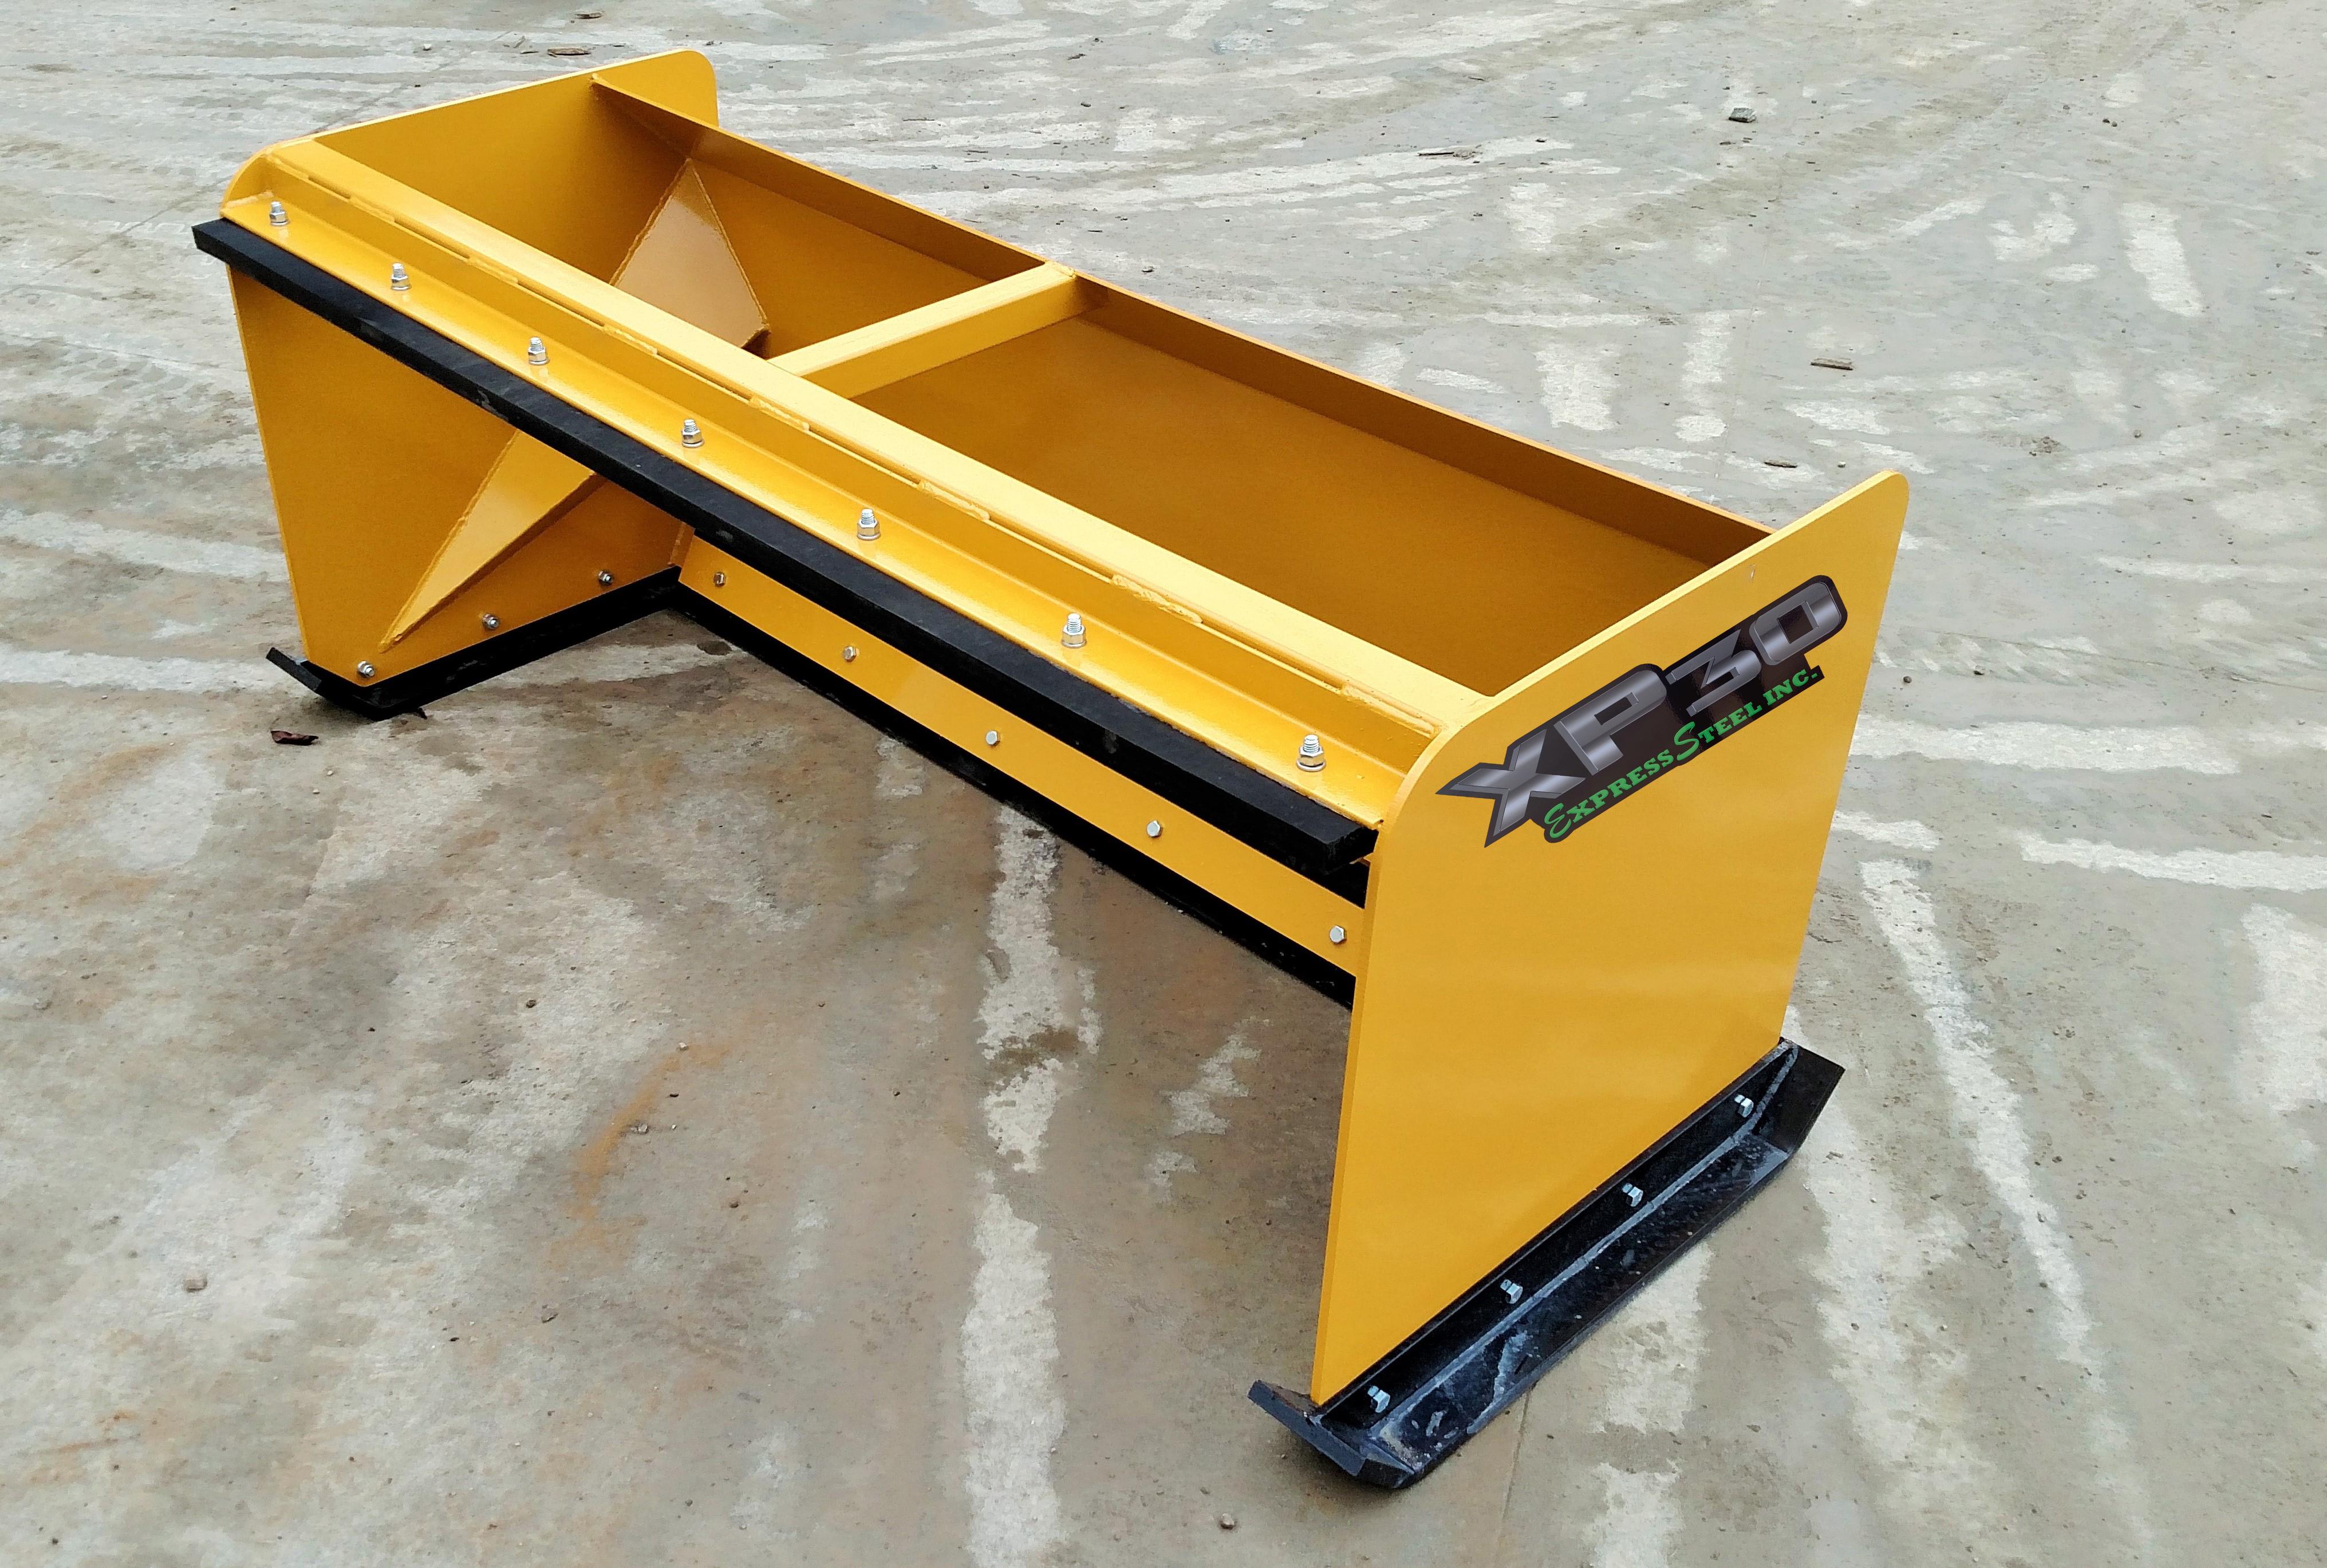 6/' XP30 Pullback John Deere snow pusher skid steer loader tractor-FREE SHIPPING